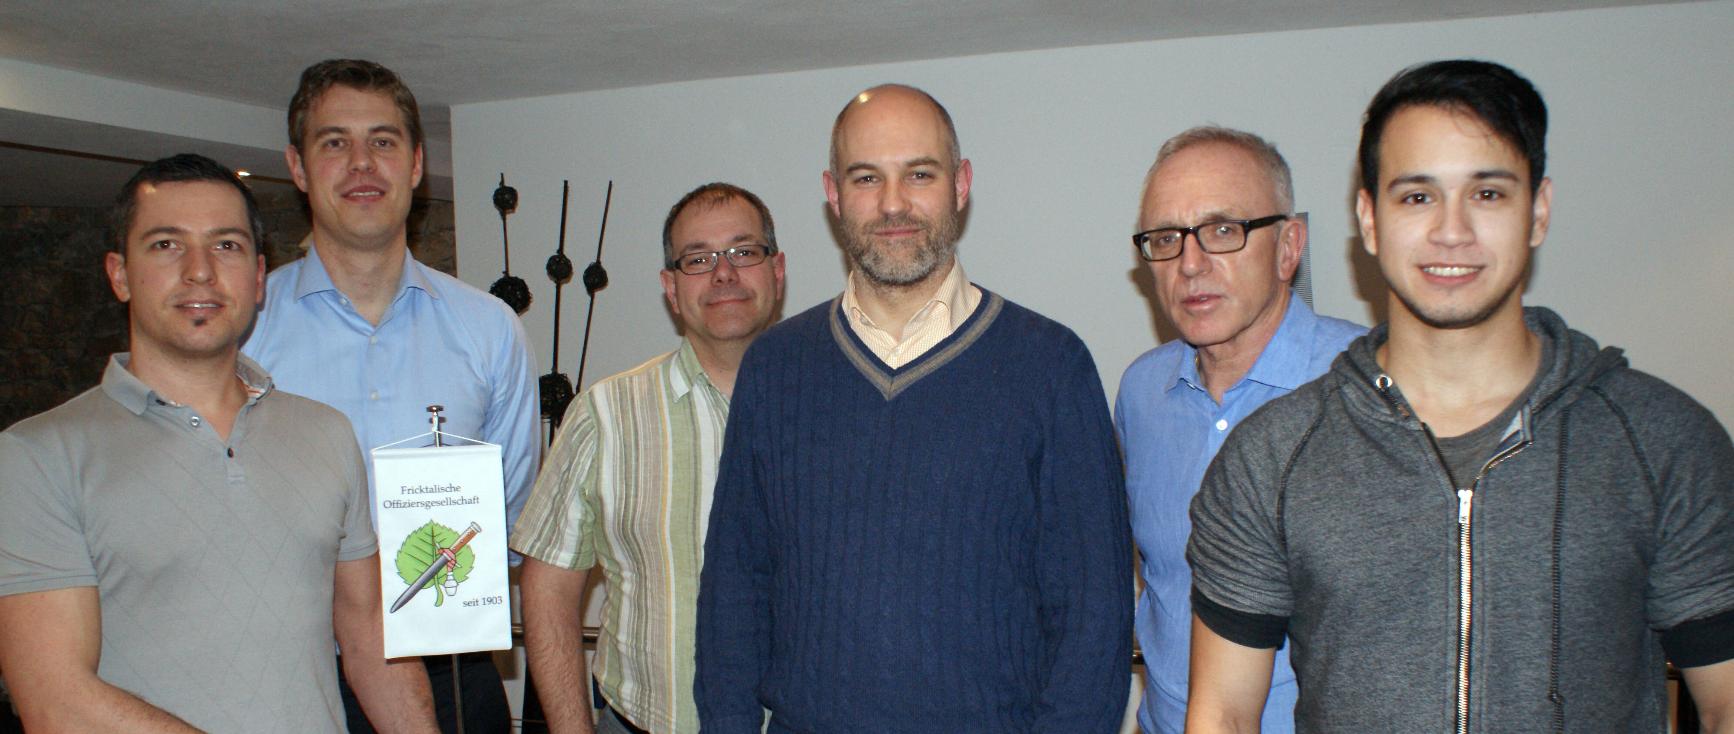 FOG Vorstand 2015